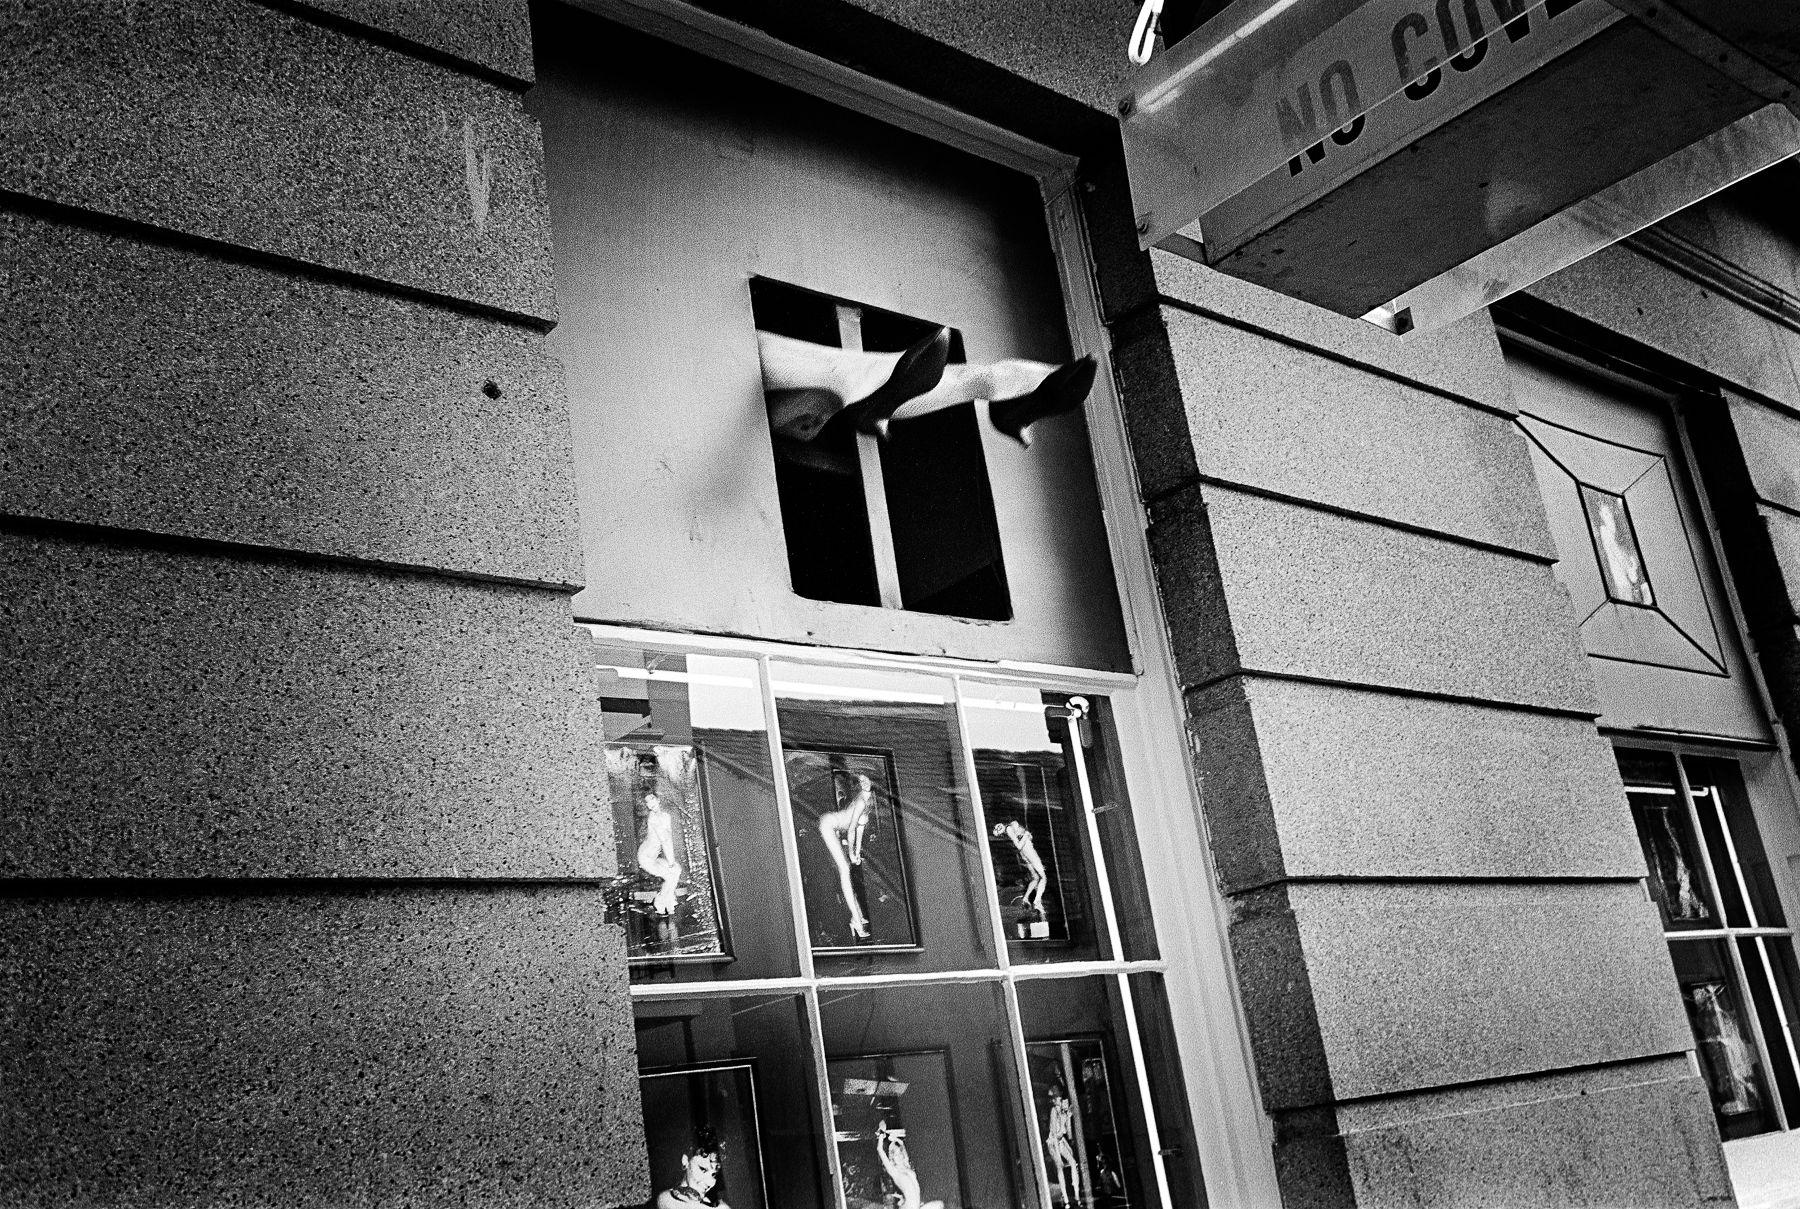 French Quarter, New Orleans, LA 1994